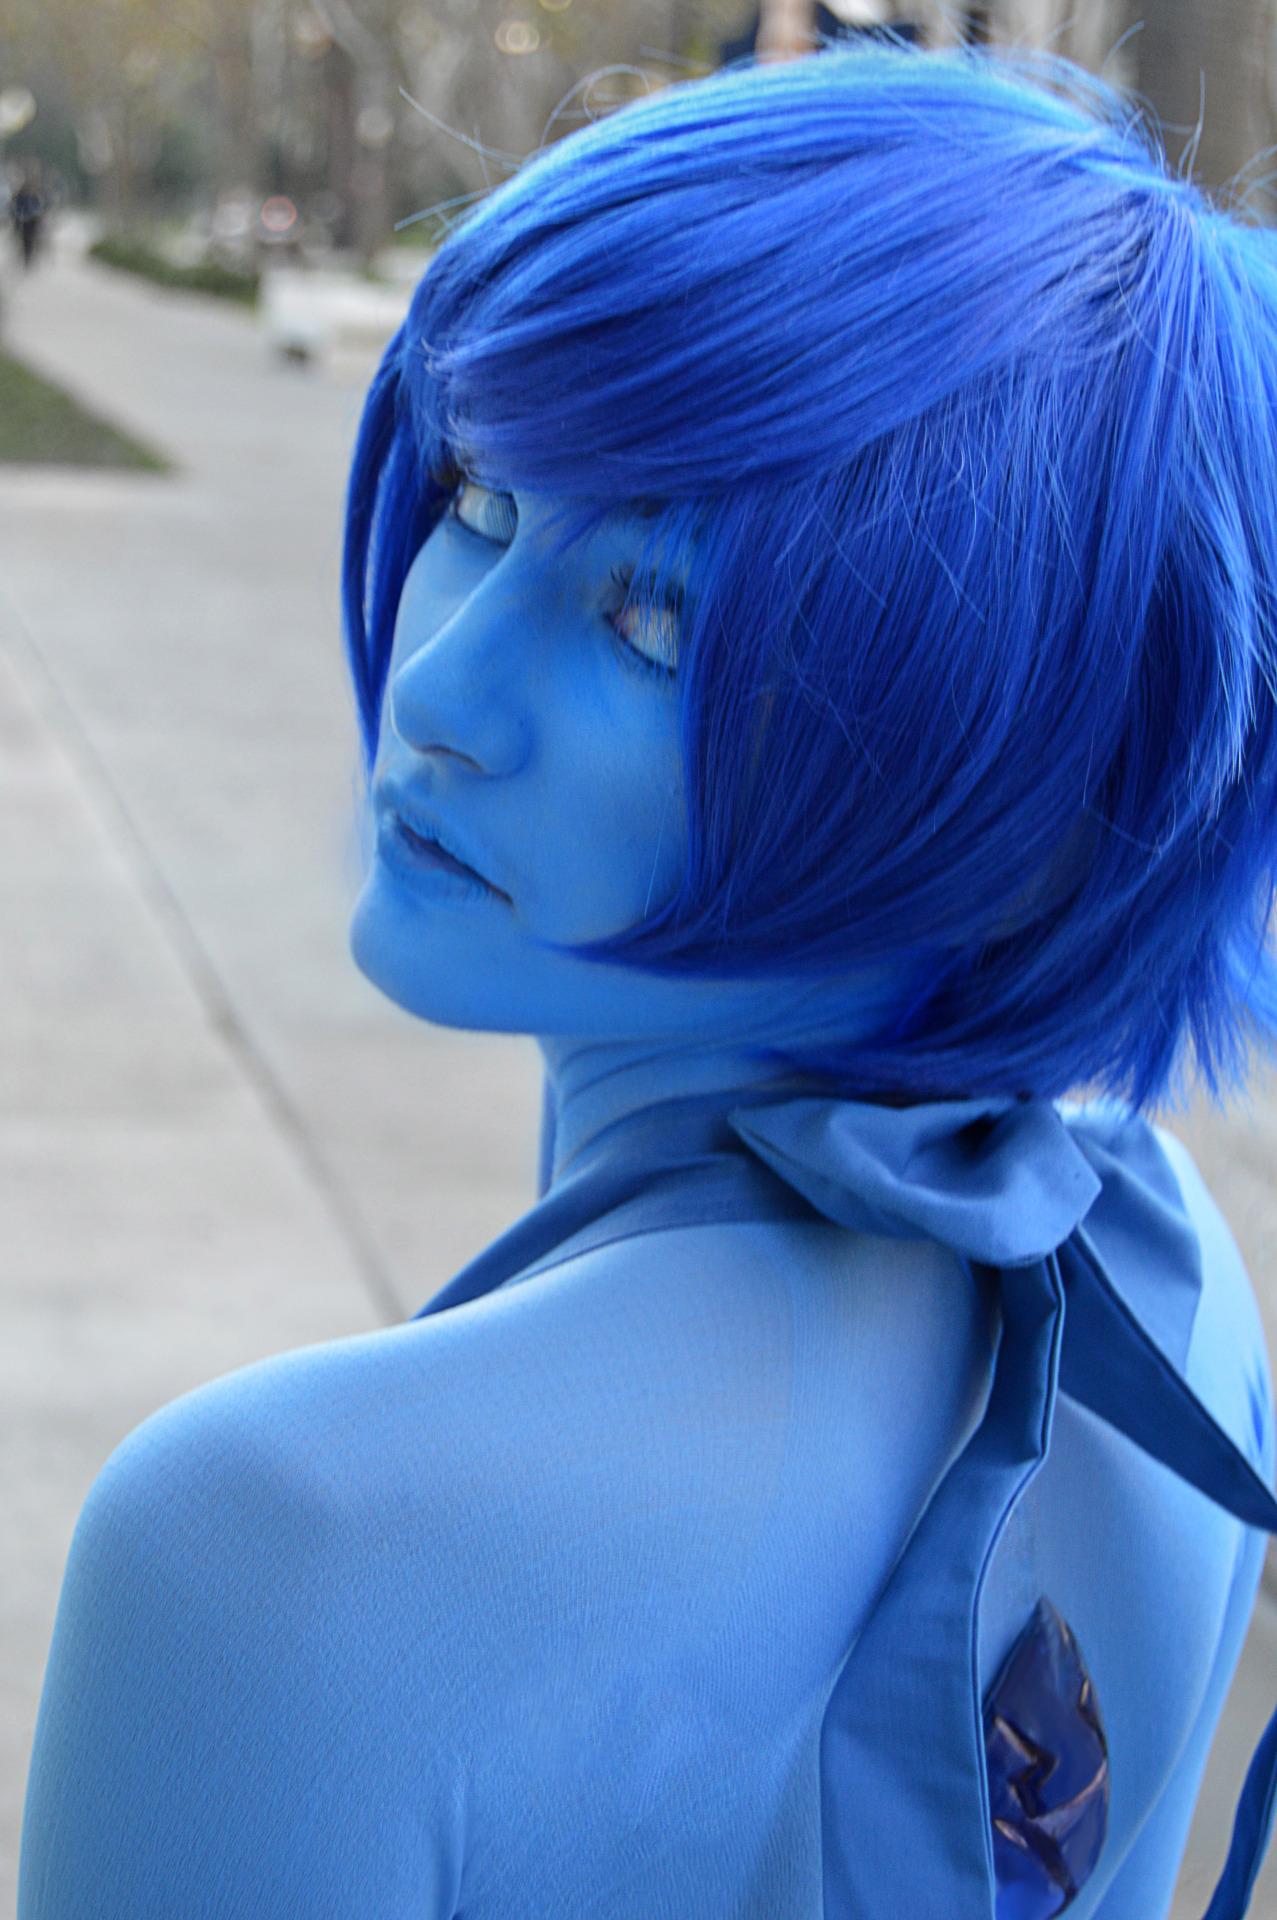 Lapis lazuli steven universe cosplay